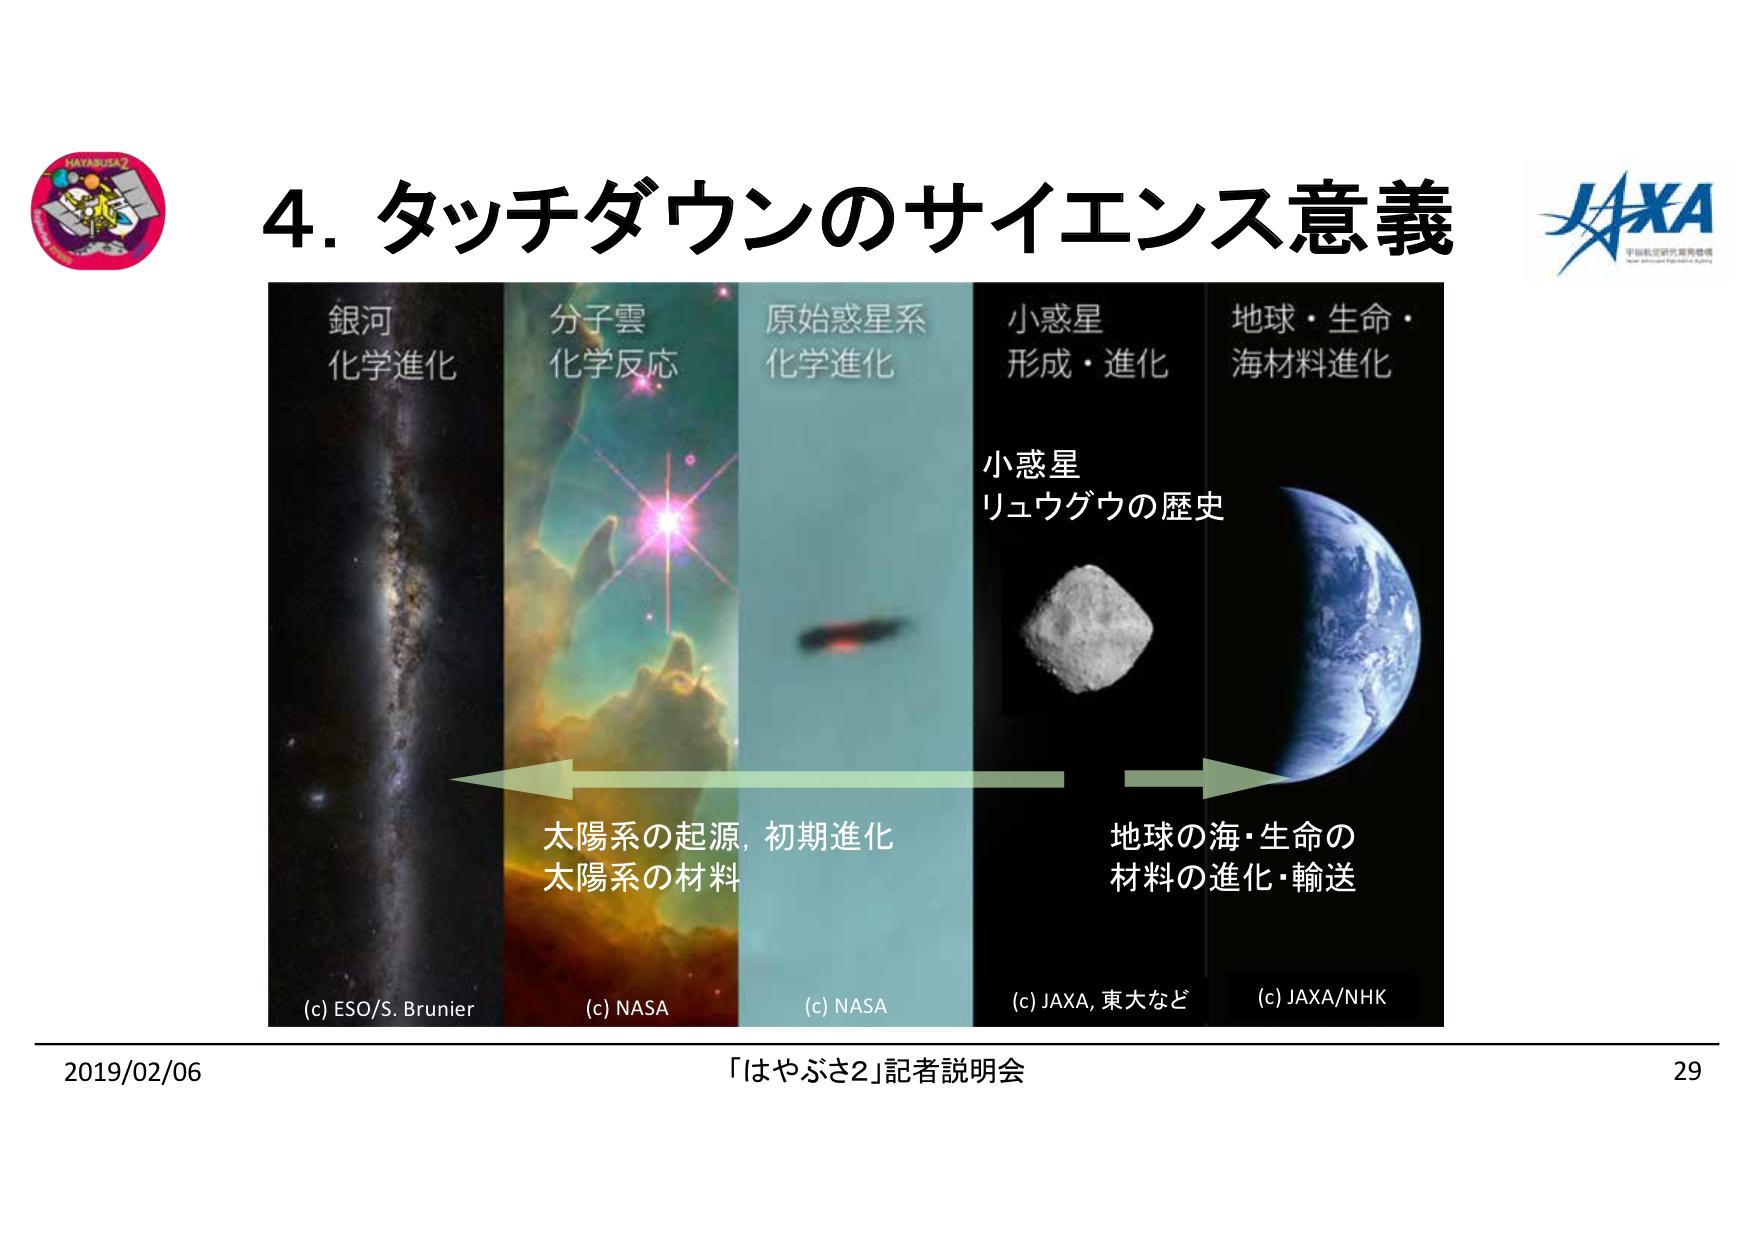 f:id:Imamura:20190204175523p:plain